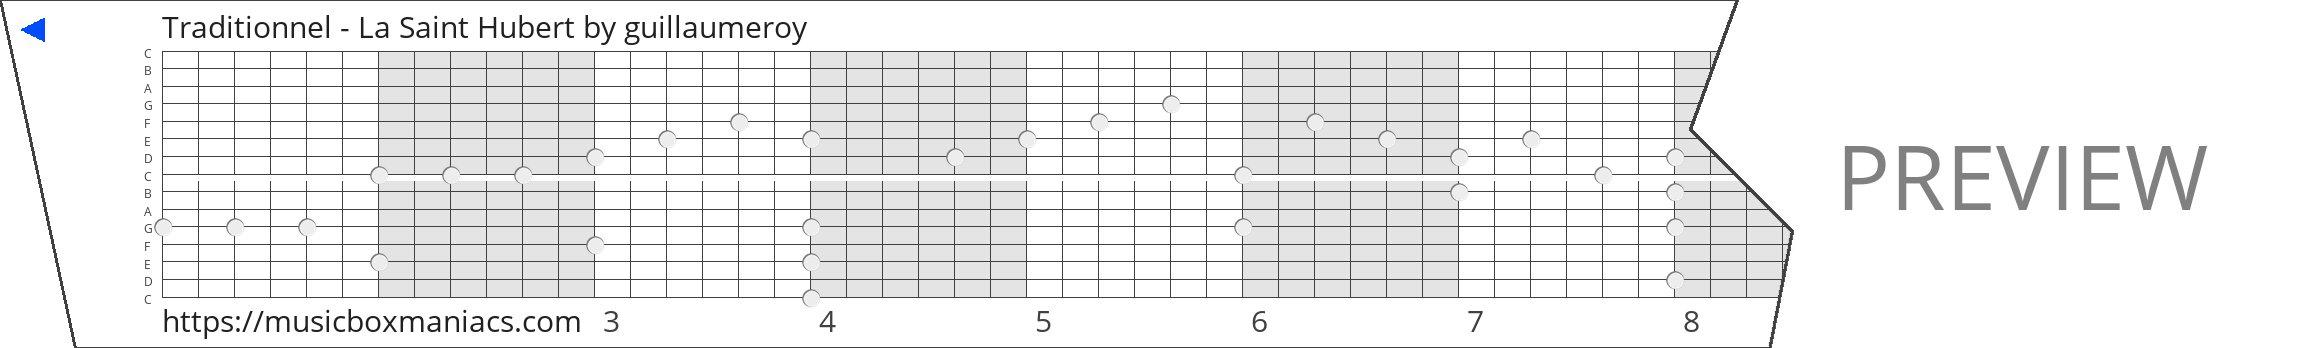 Traditionnel - La Saint Hubert 15 note music box paper strip